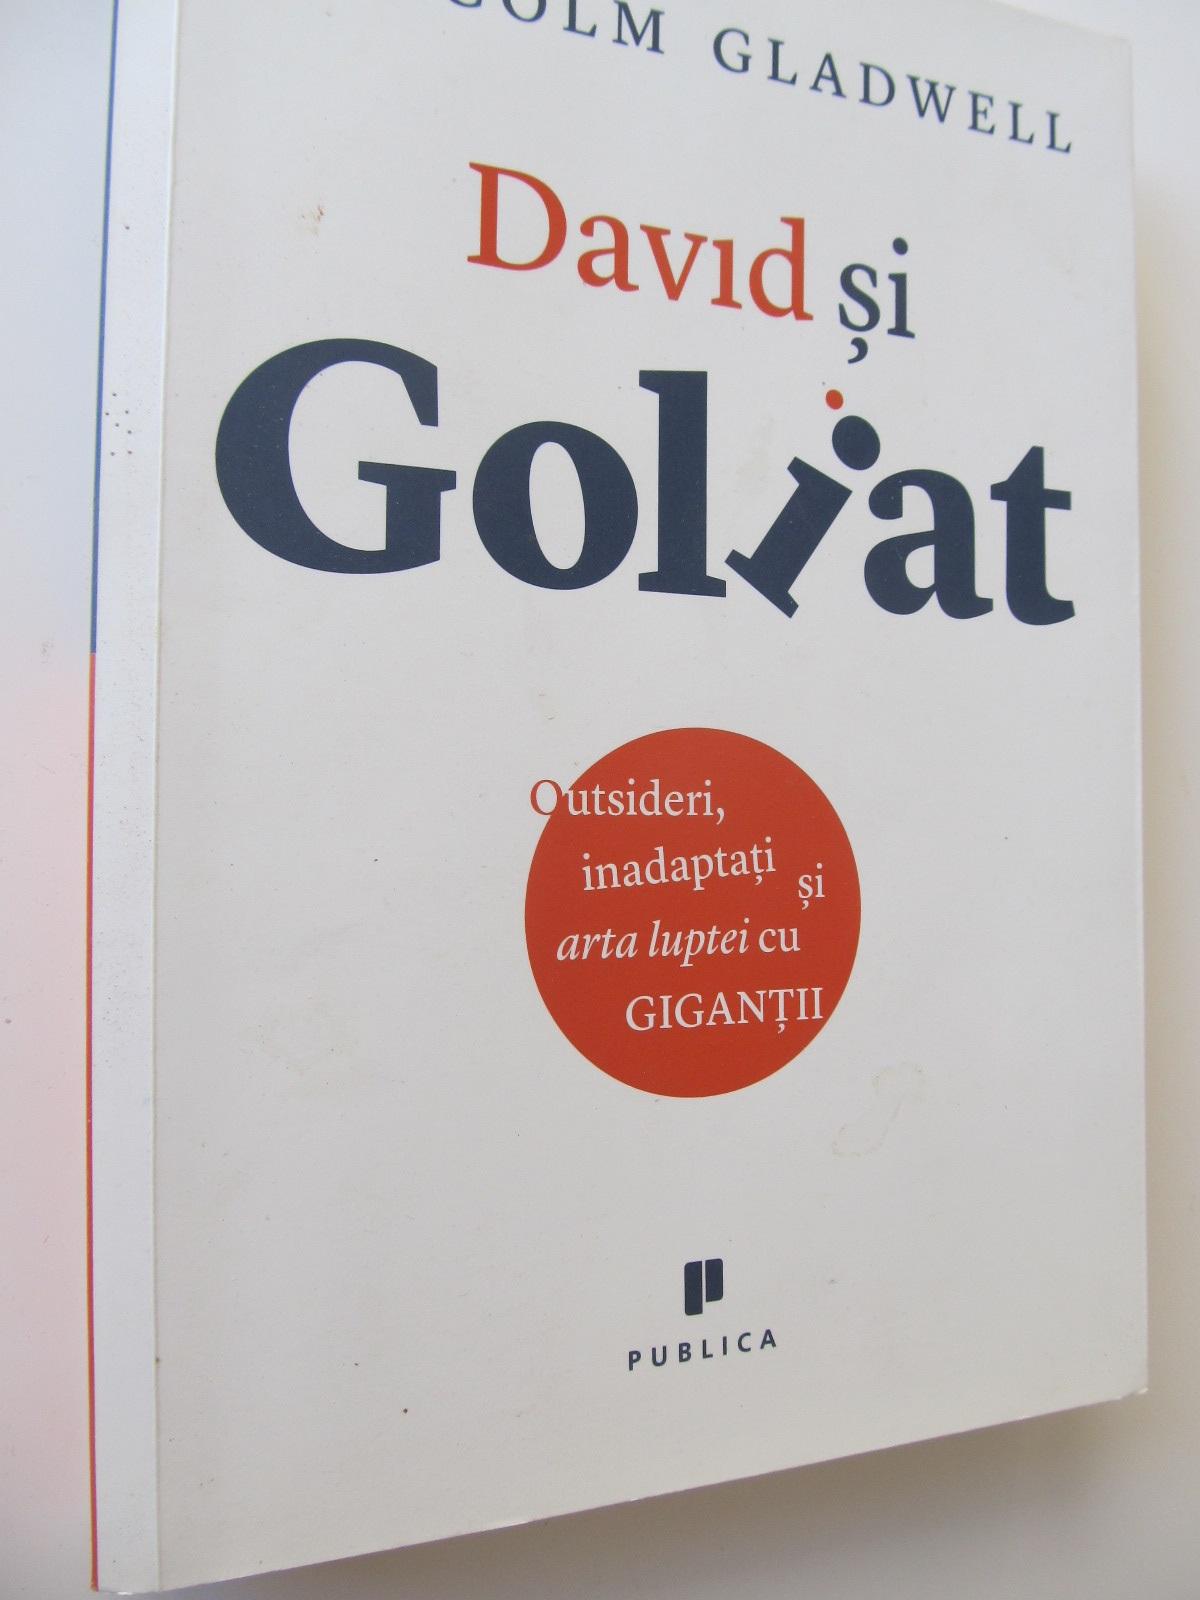 David si Goliat - Outsideri inadaptati si arta luptei cu gigantii - Malcolm Gladwell | Detalii carte